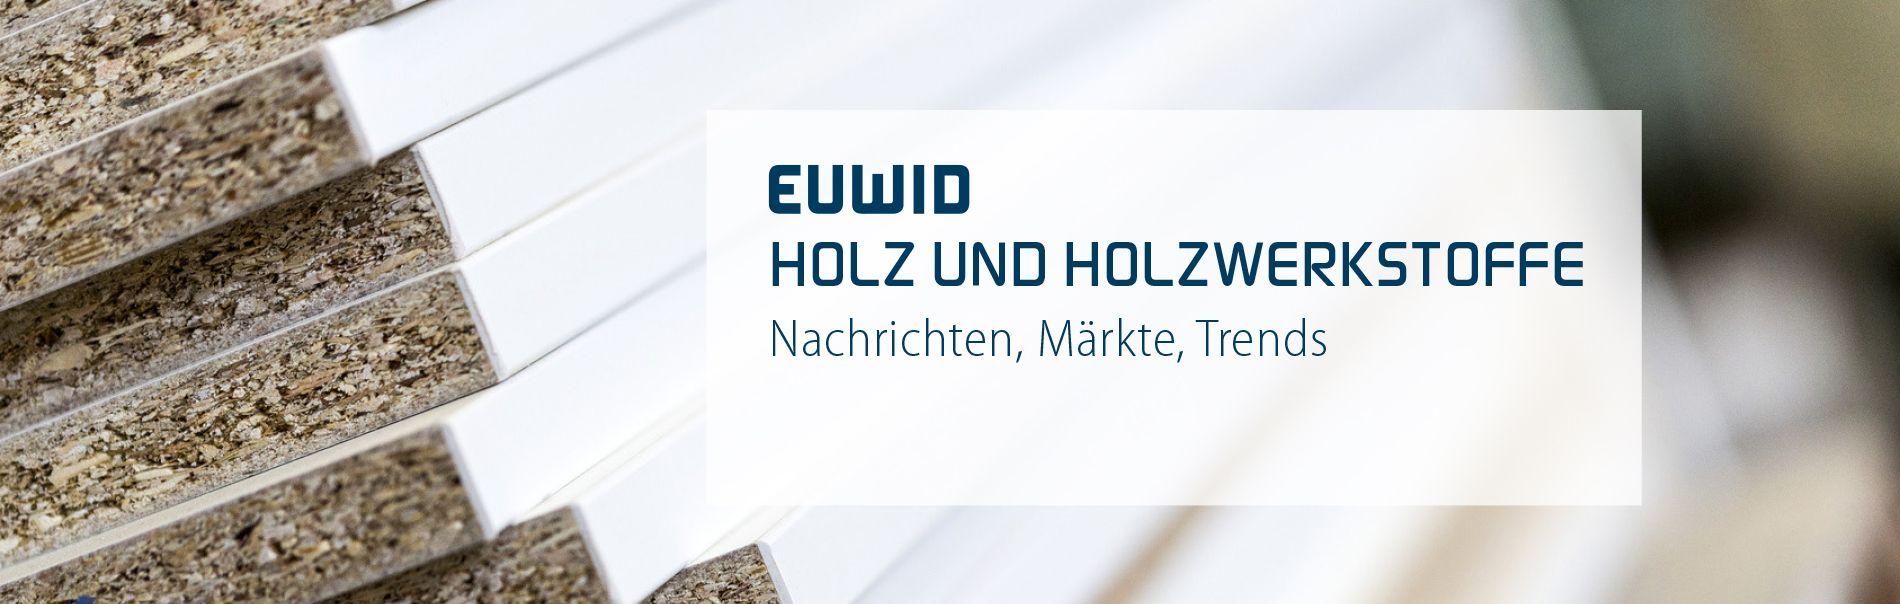 EUWID Holz und Holzwerkstoffe